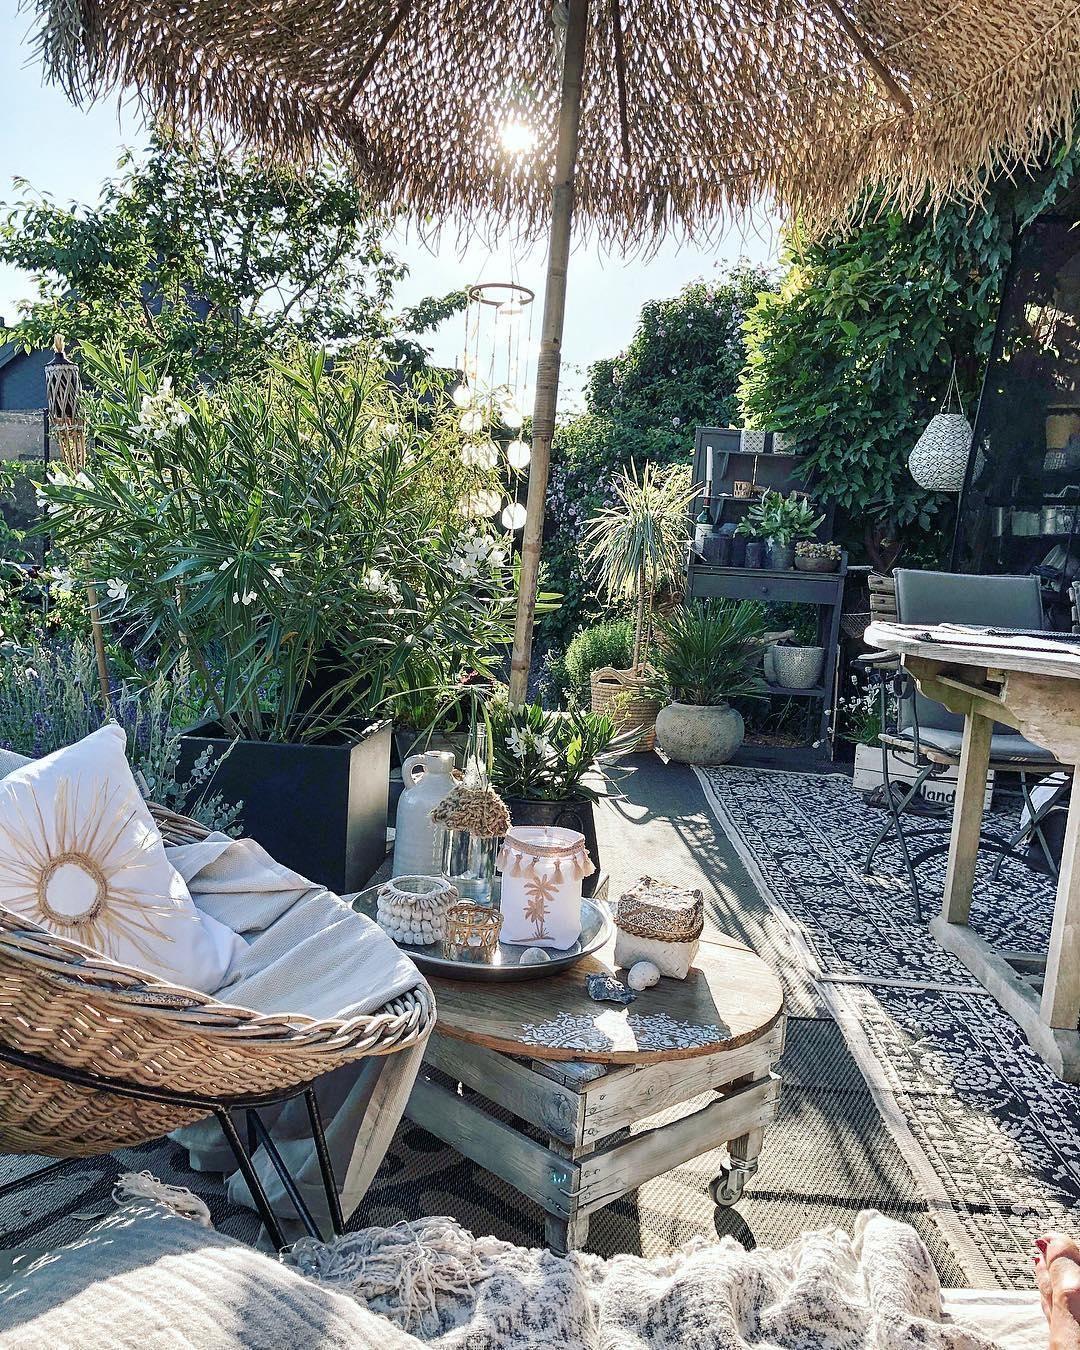 Outdoor- & Gartenartikel online kaufen   WestwingNow